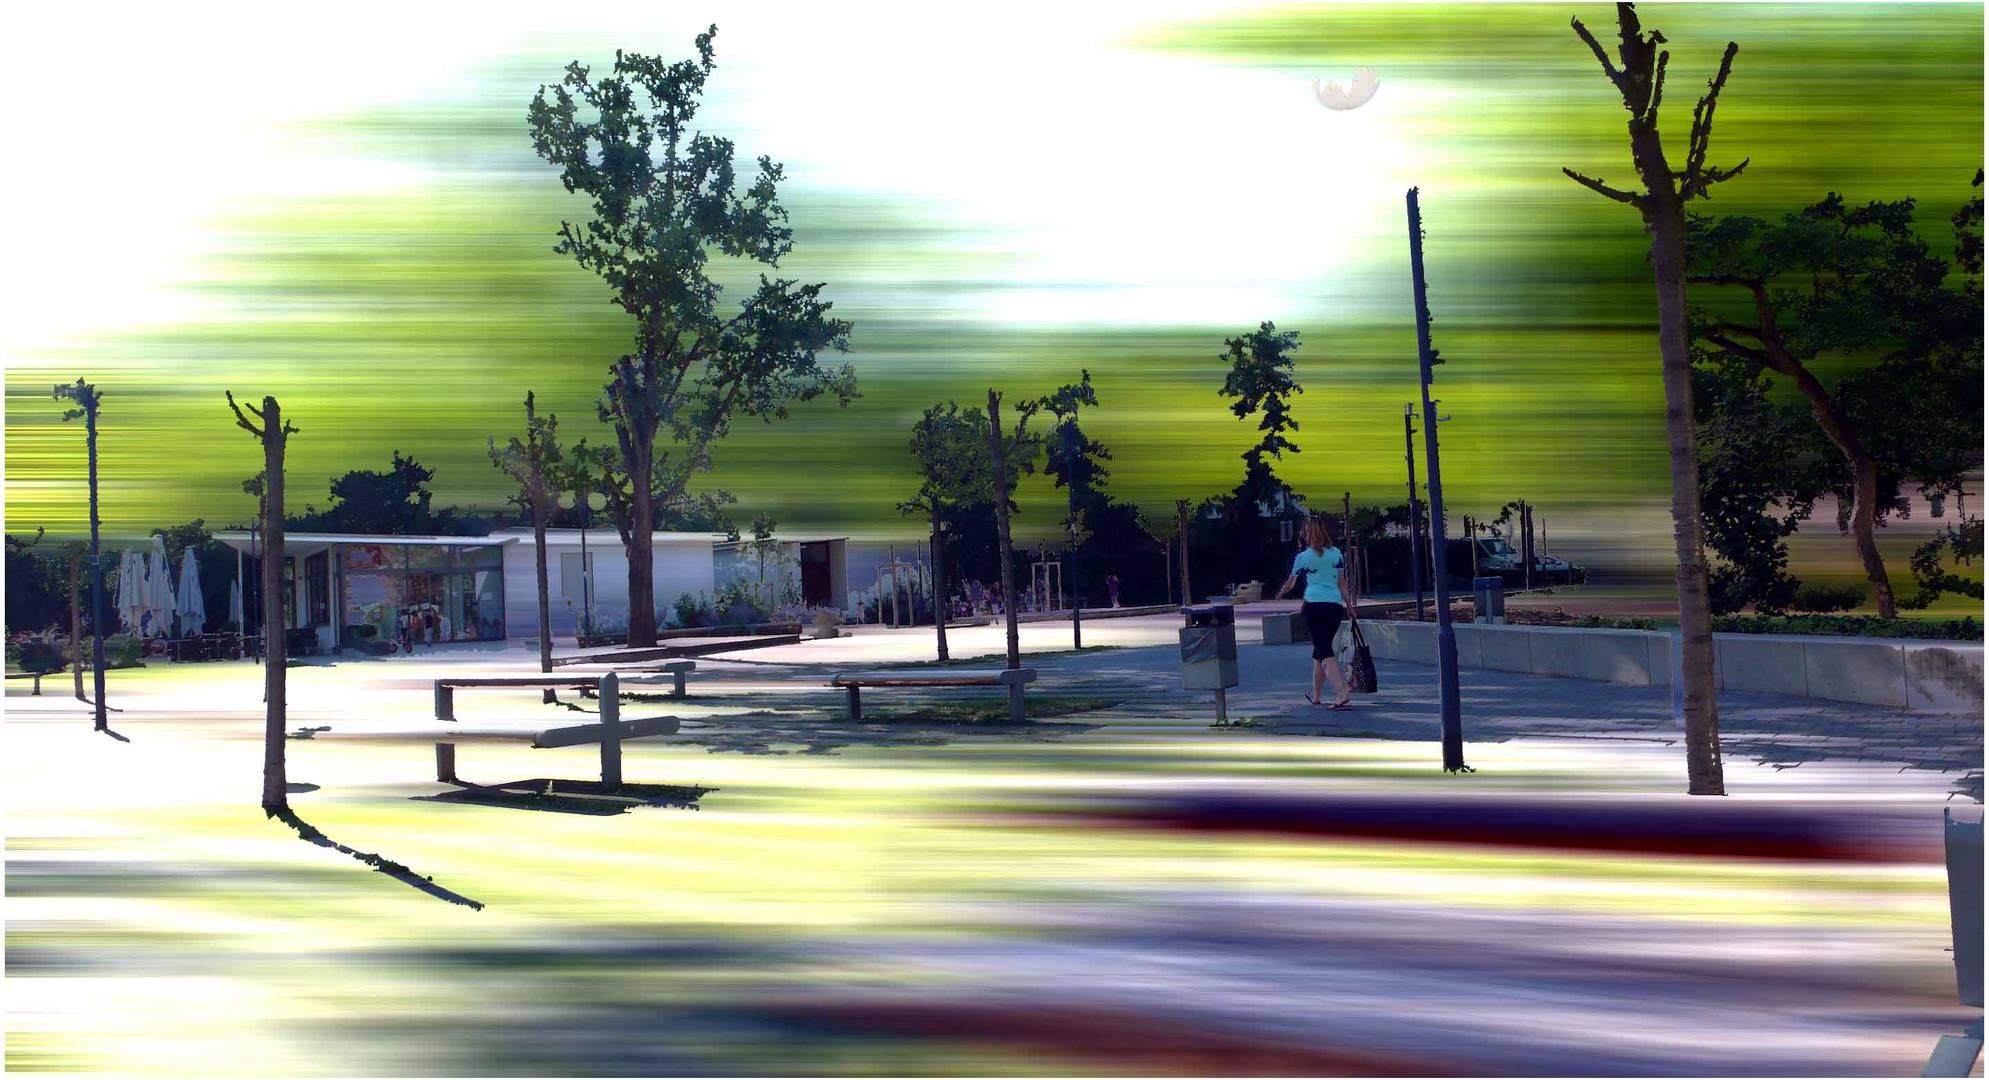 LiLi Park